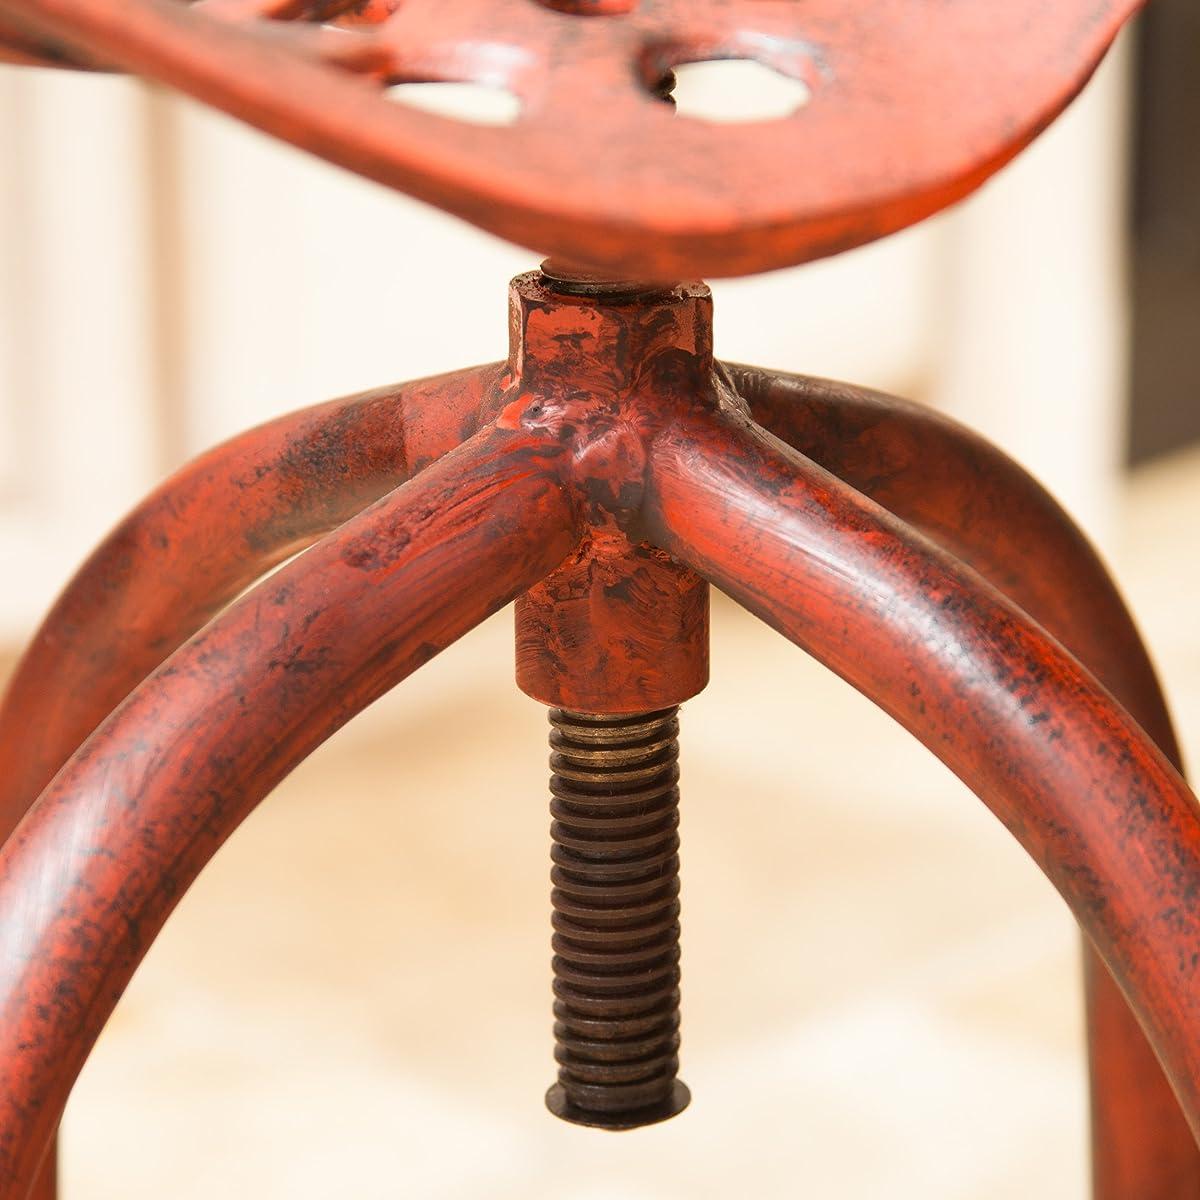 Aldean Red Industrial Design Metal Tractor Adjustable Height Seat Stool